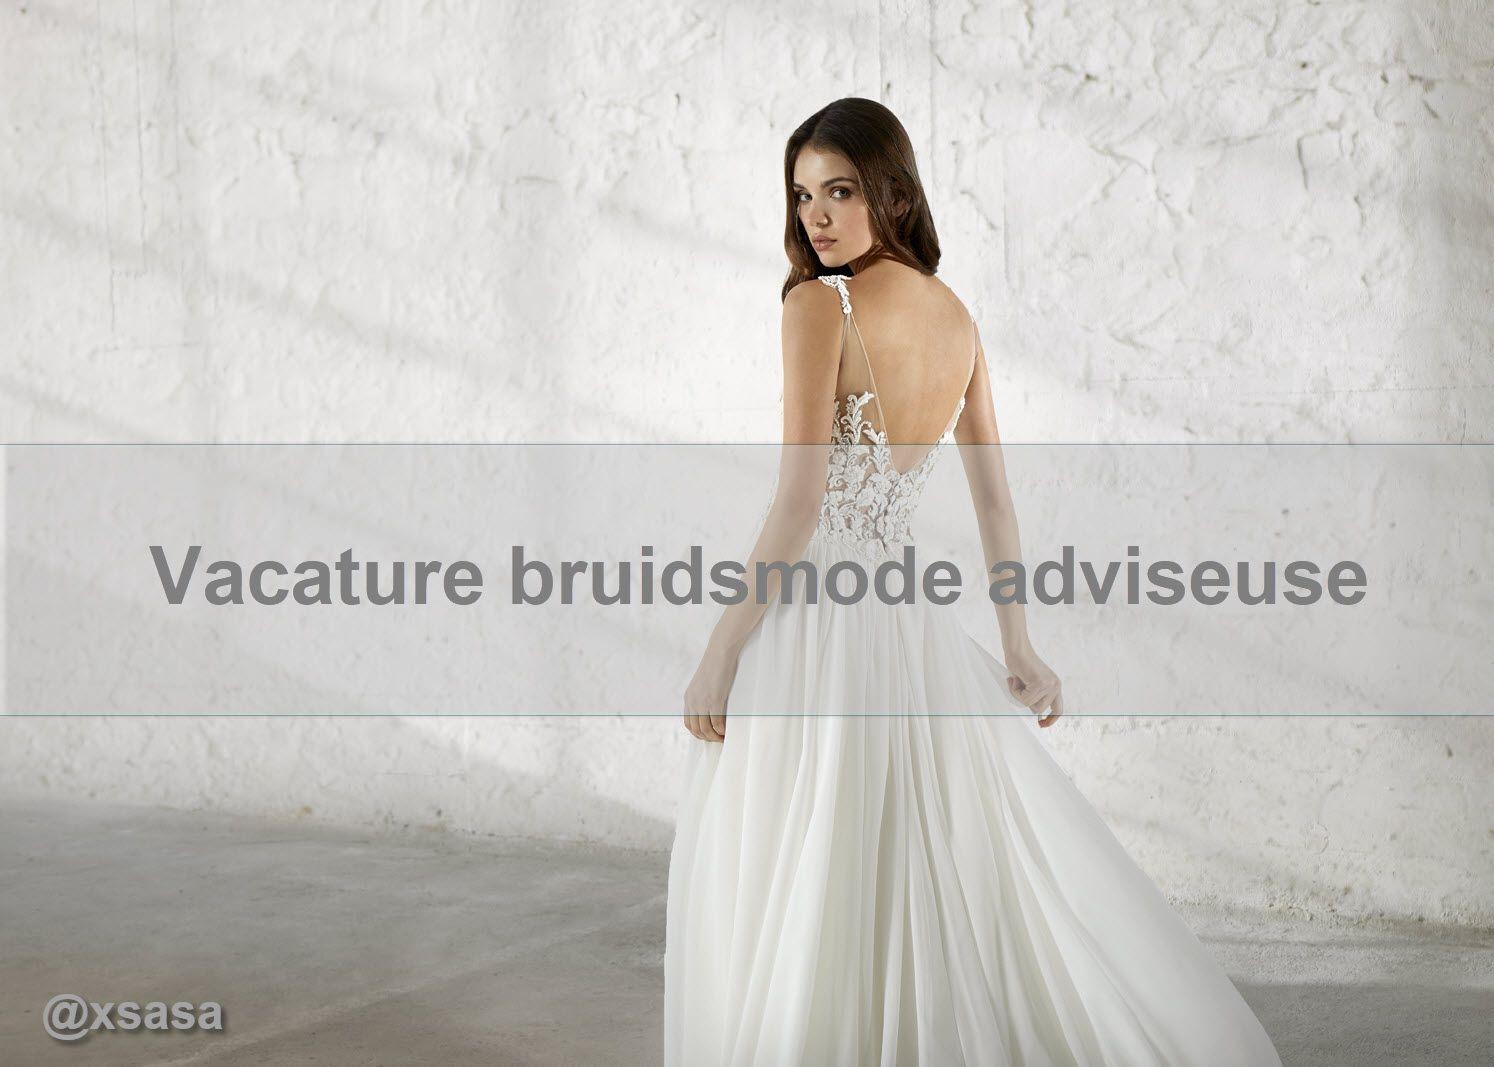 vacature bruidsmode